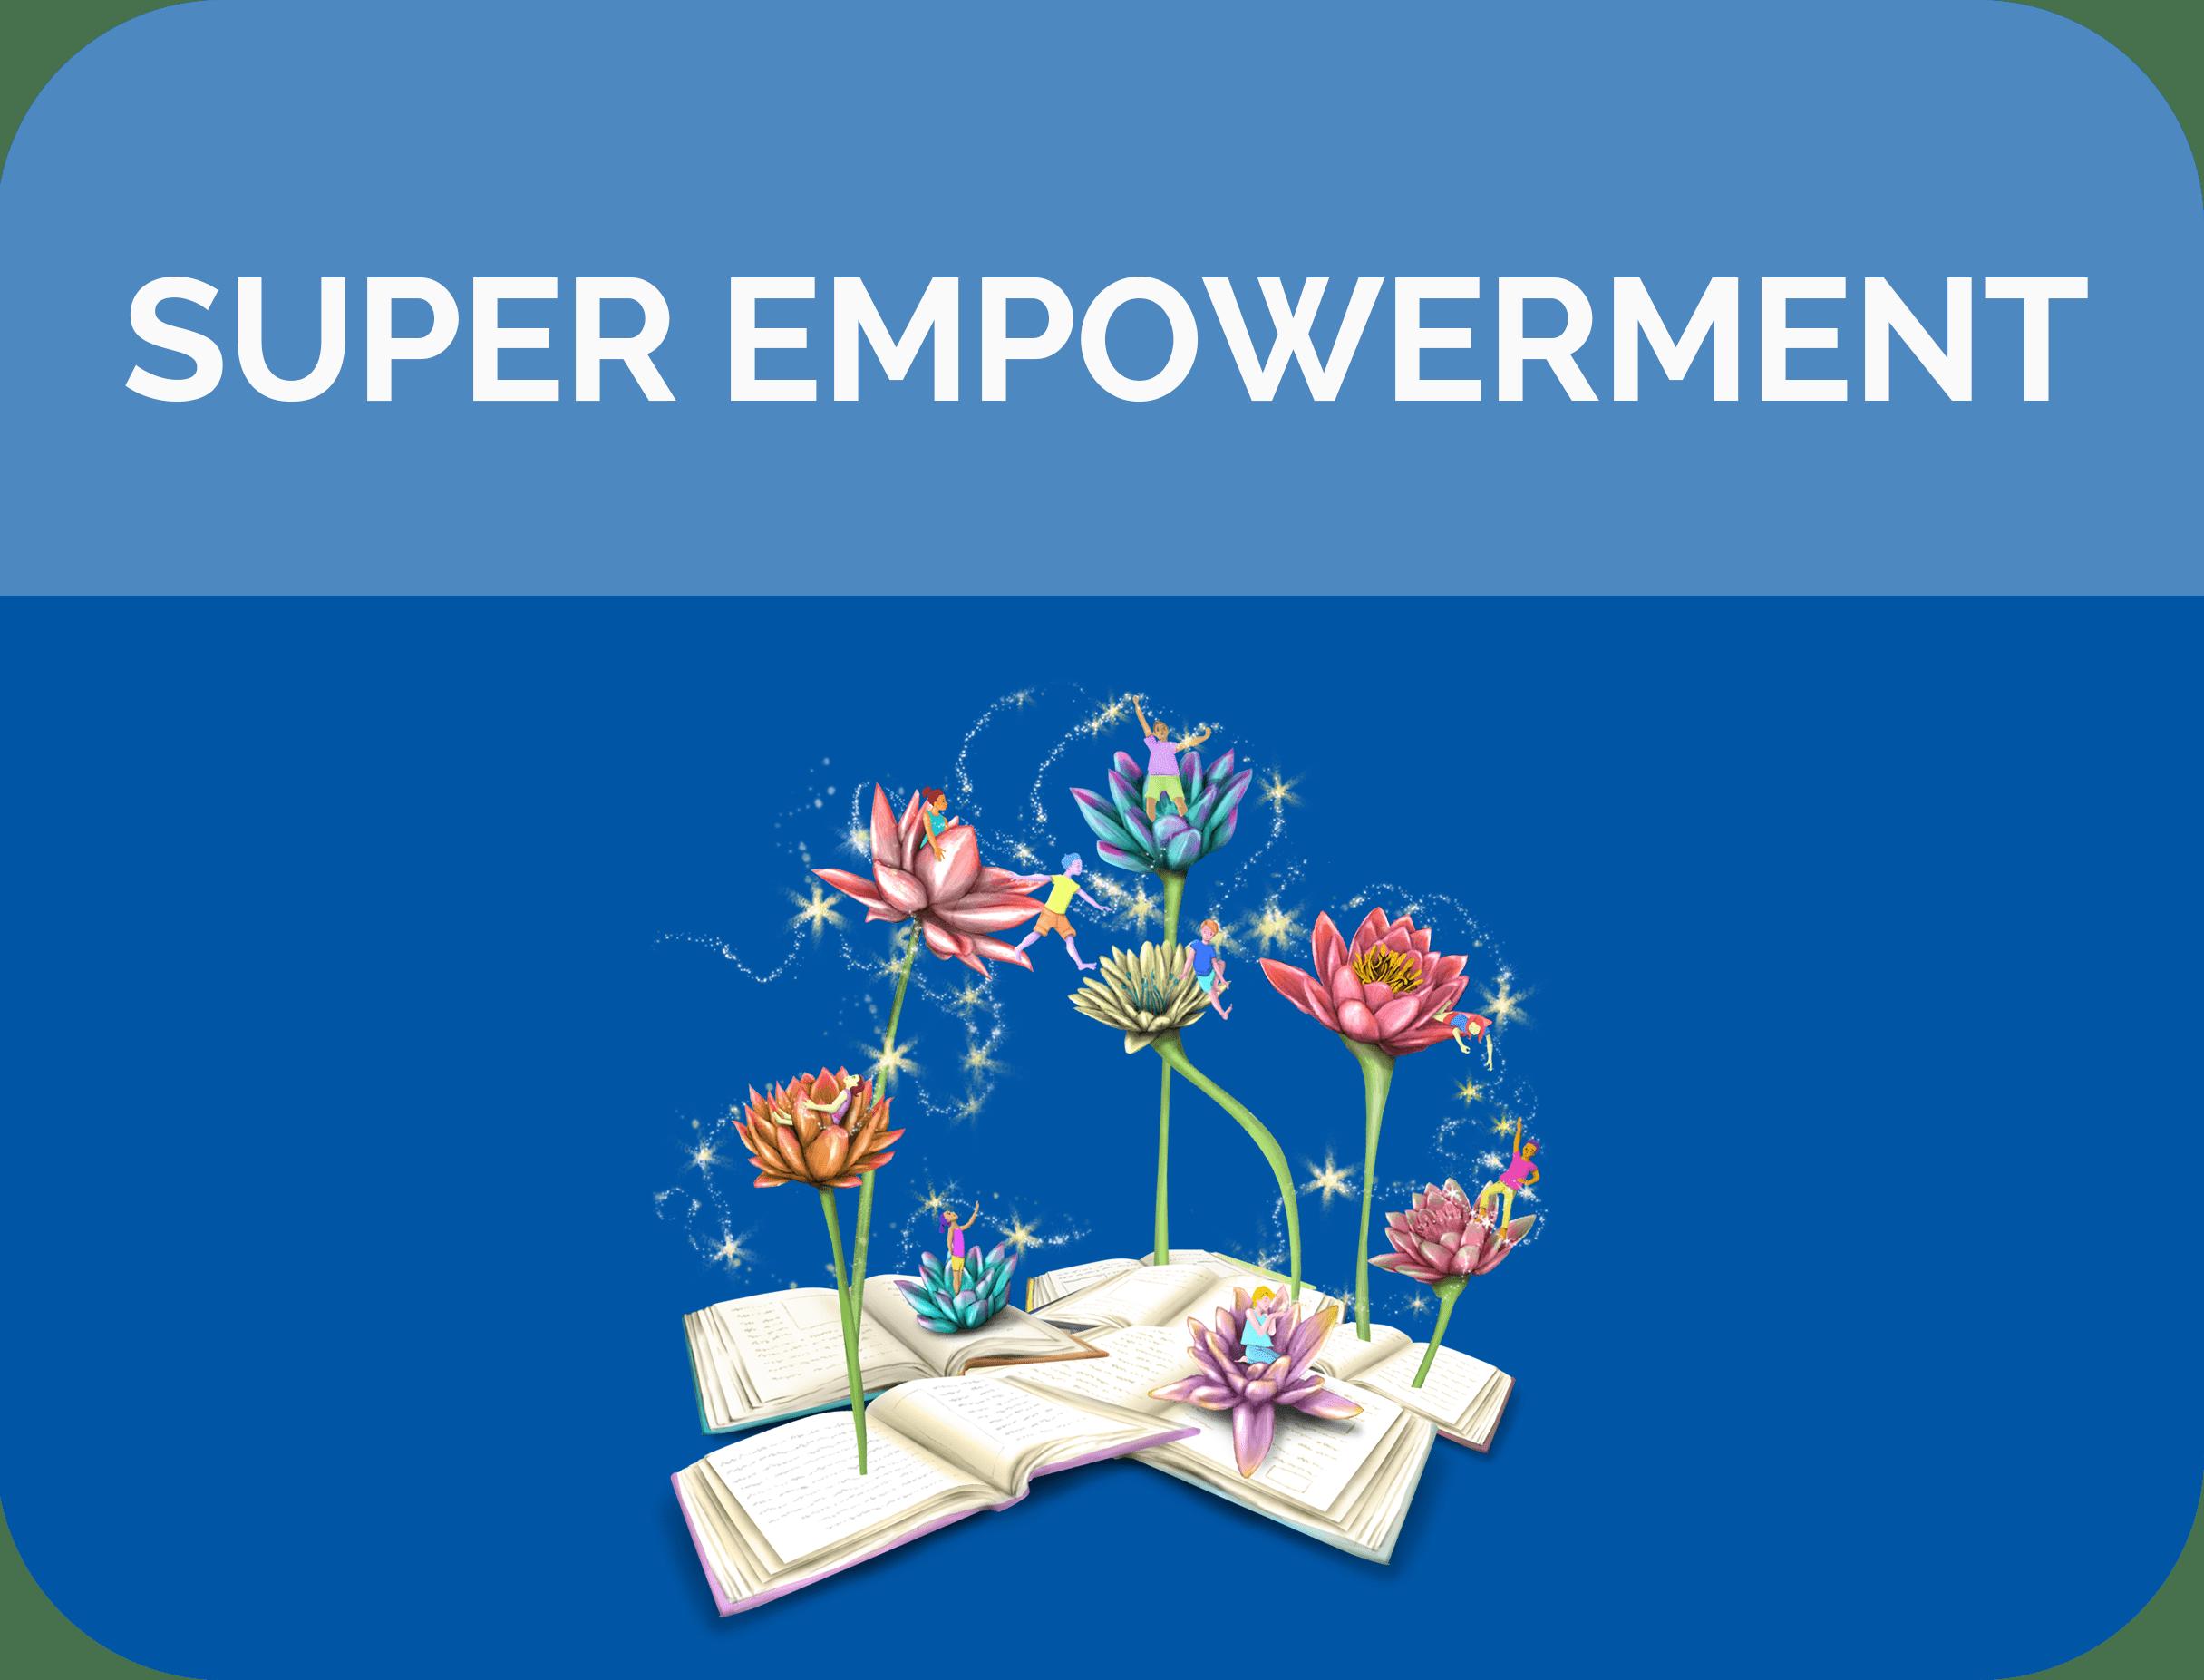 Super Empowerment